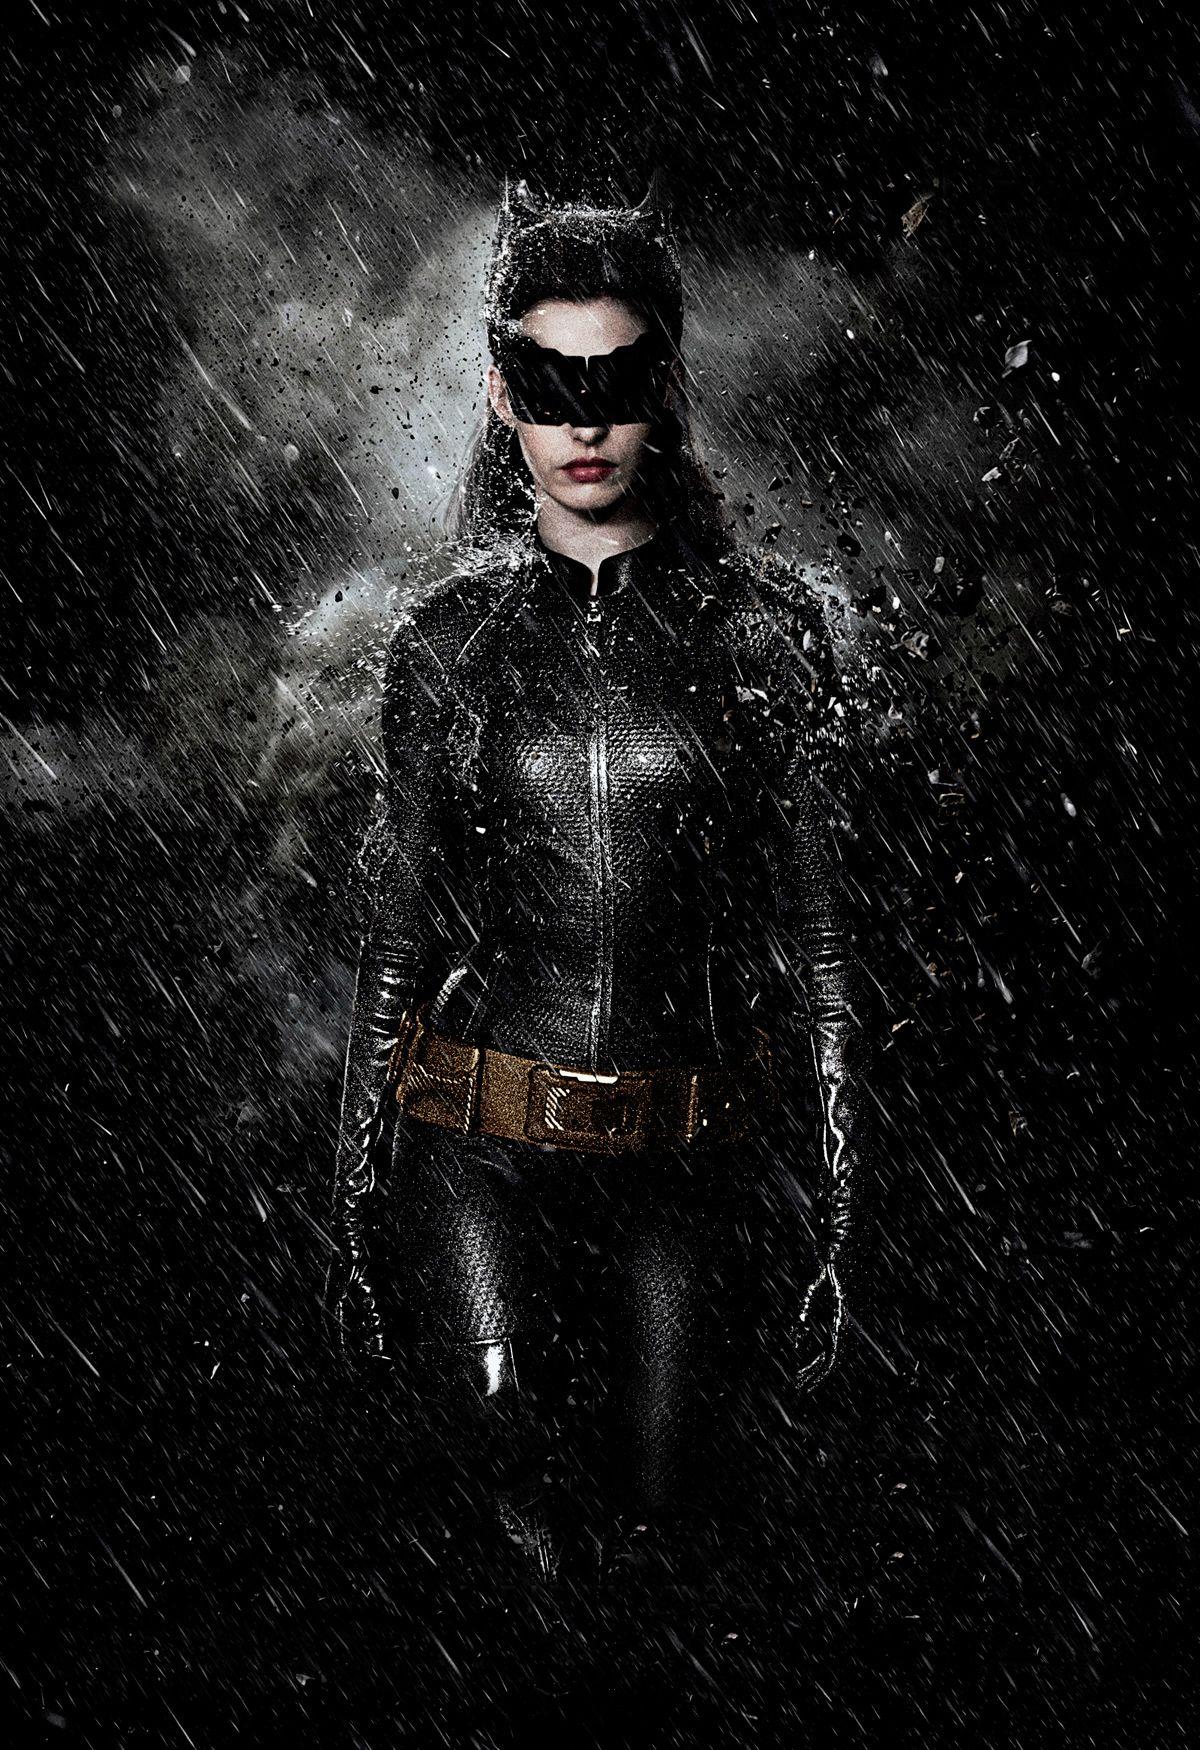 Selina Kyle (Nolanverse) | DC Movies Wiki | Fandom powered ...